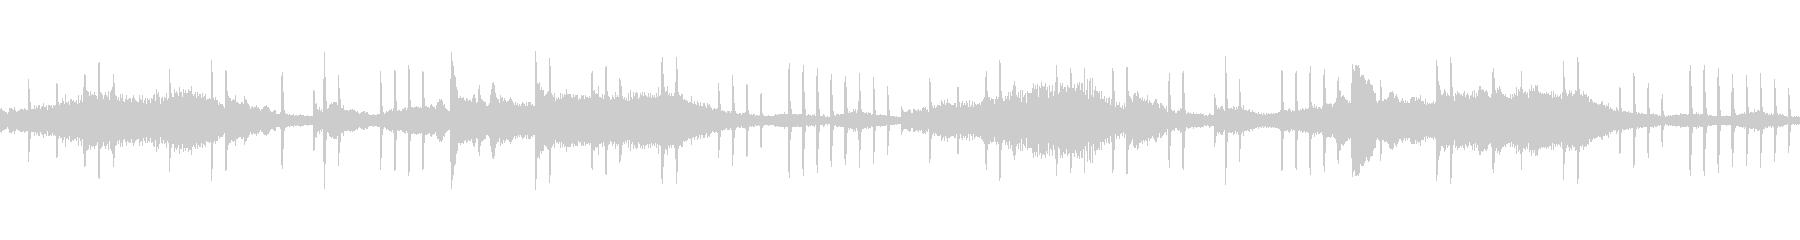 8 bar loop A's unreproduced waveform